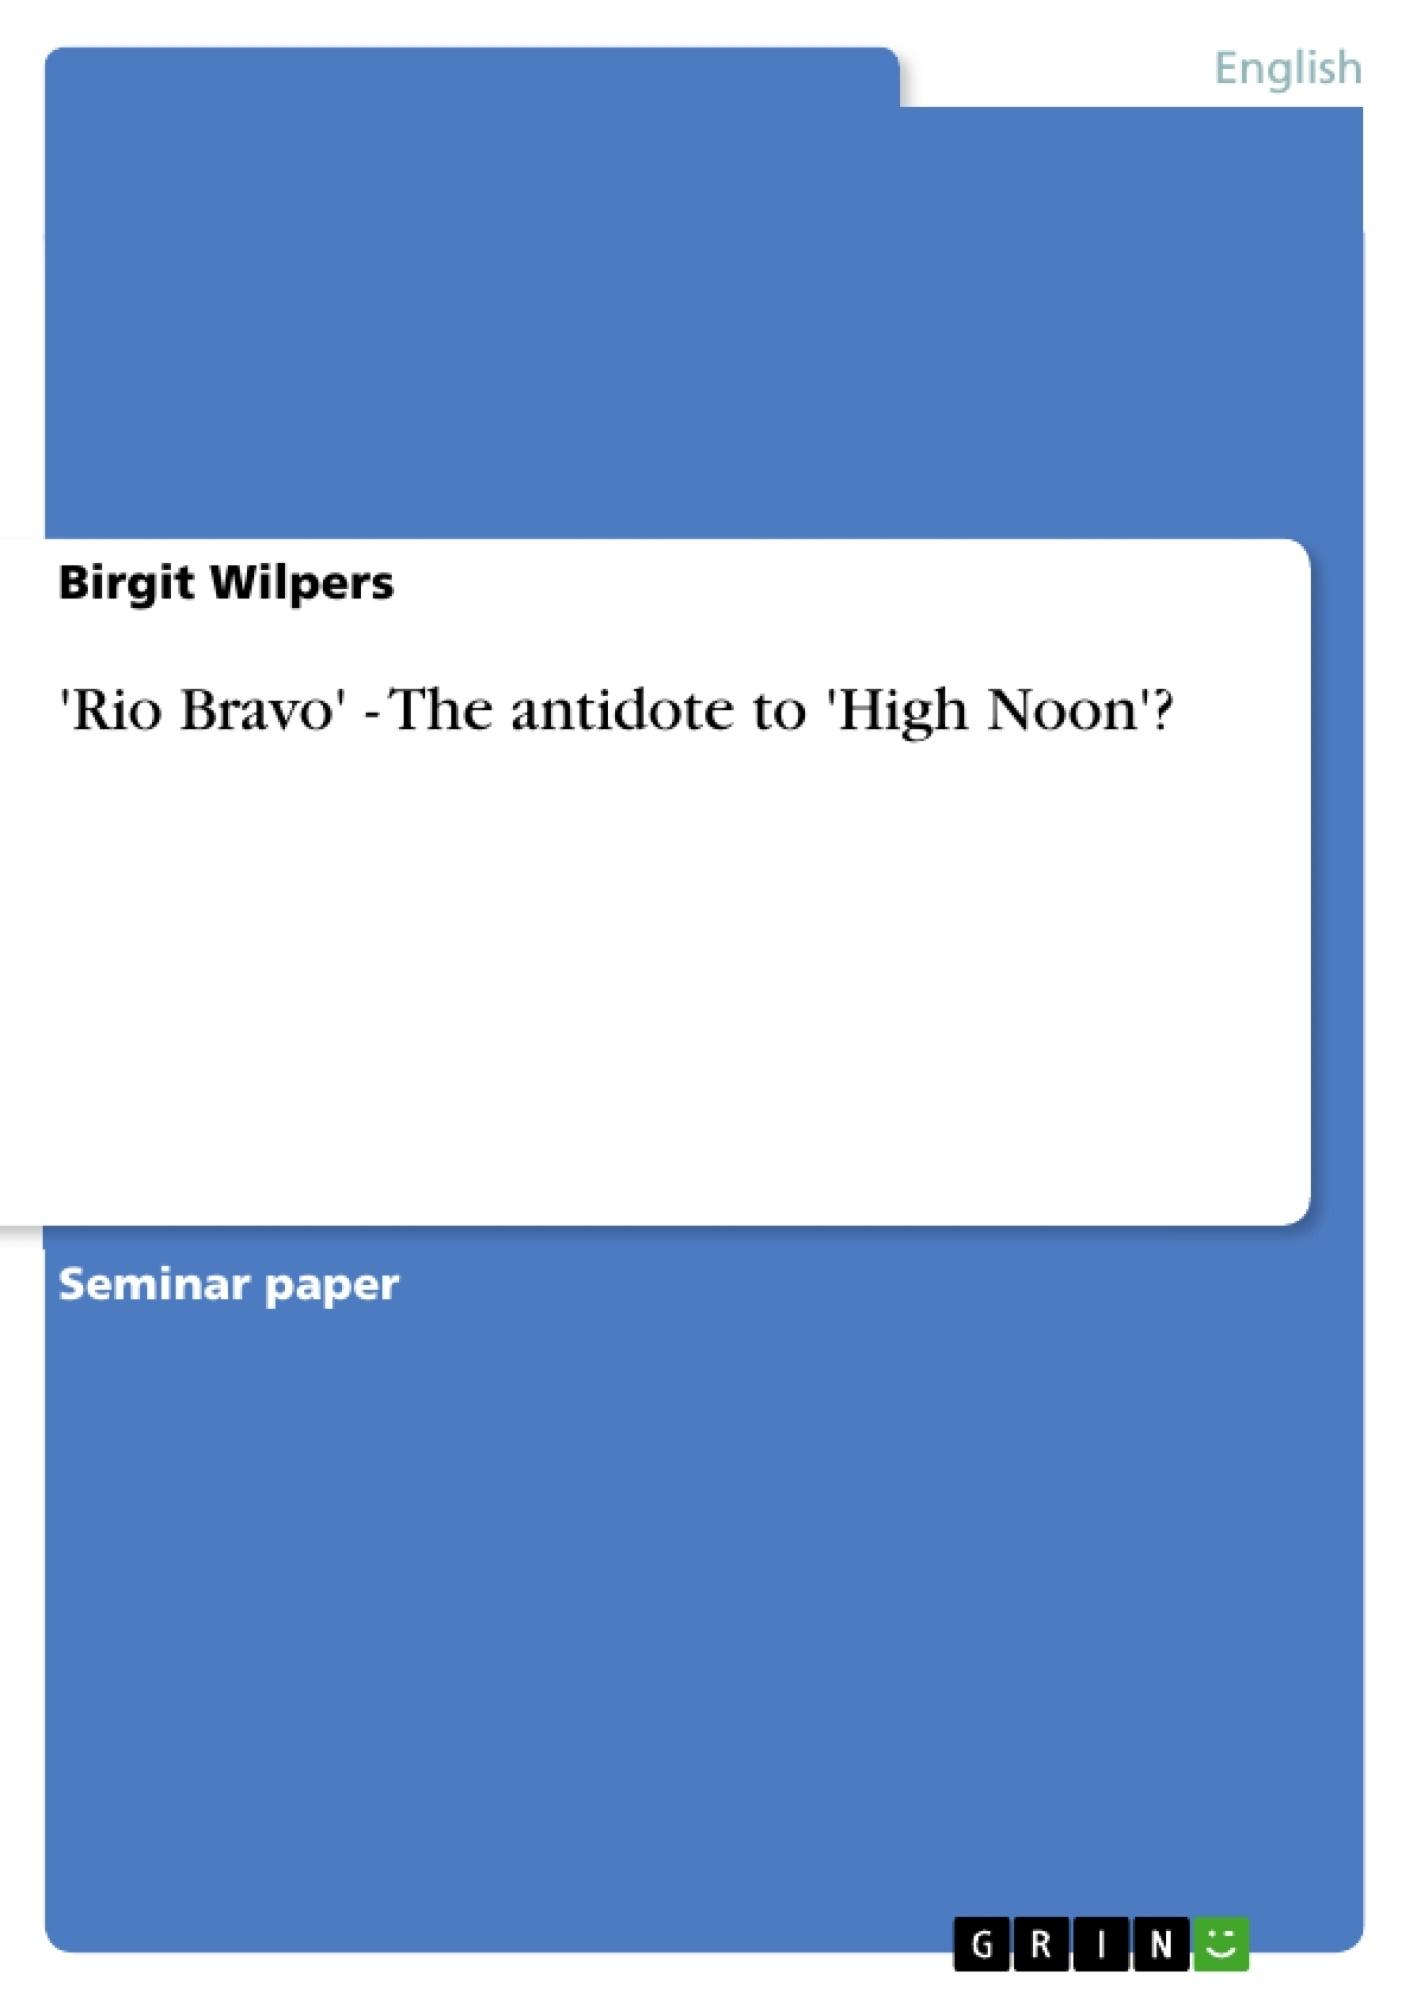 Title: 'Rio Bravo' - The antidote to 'High Noon'?